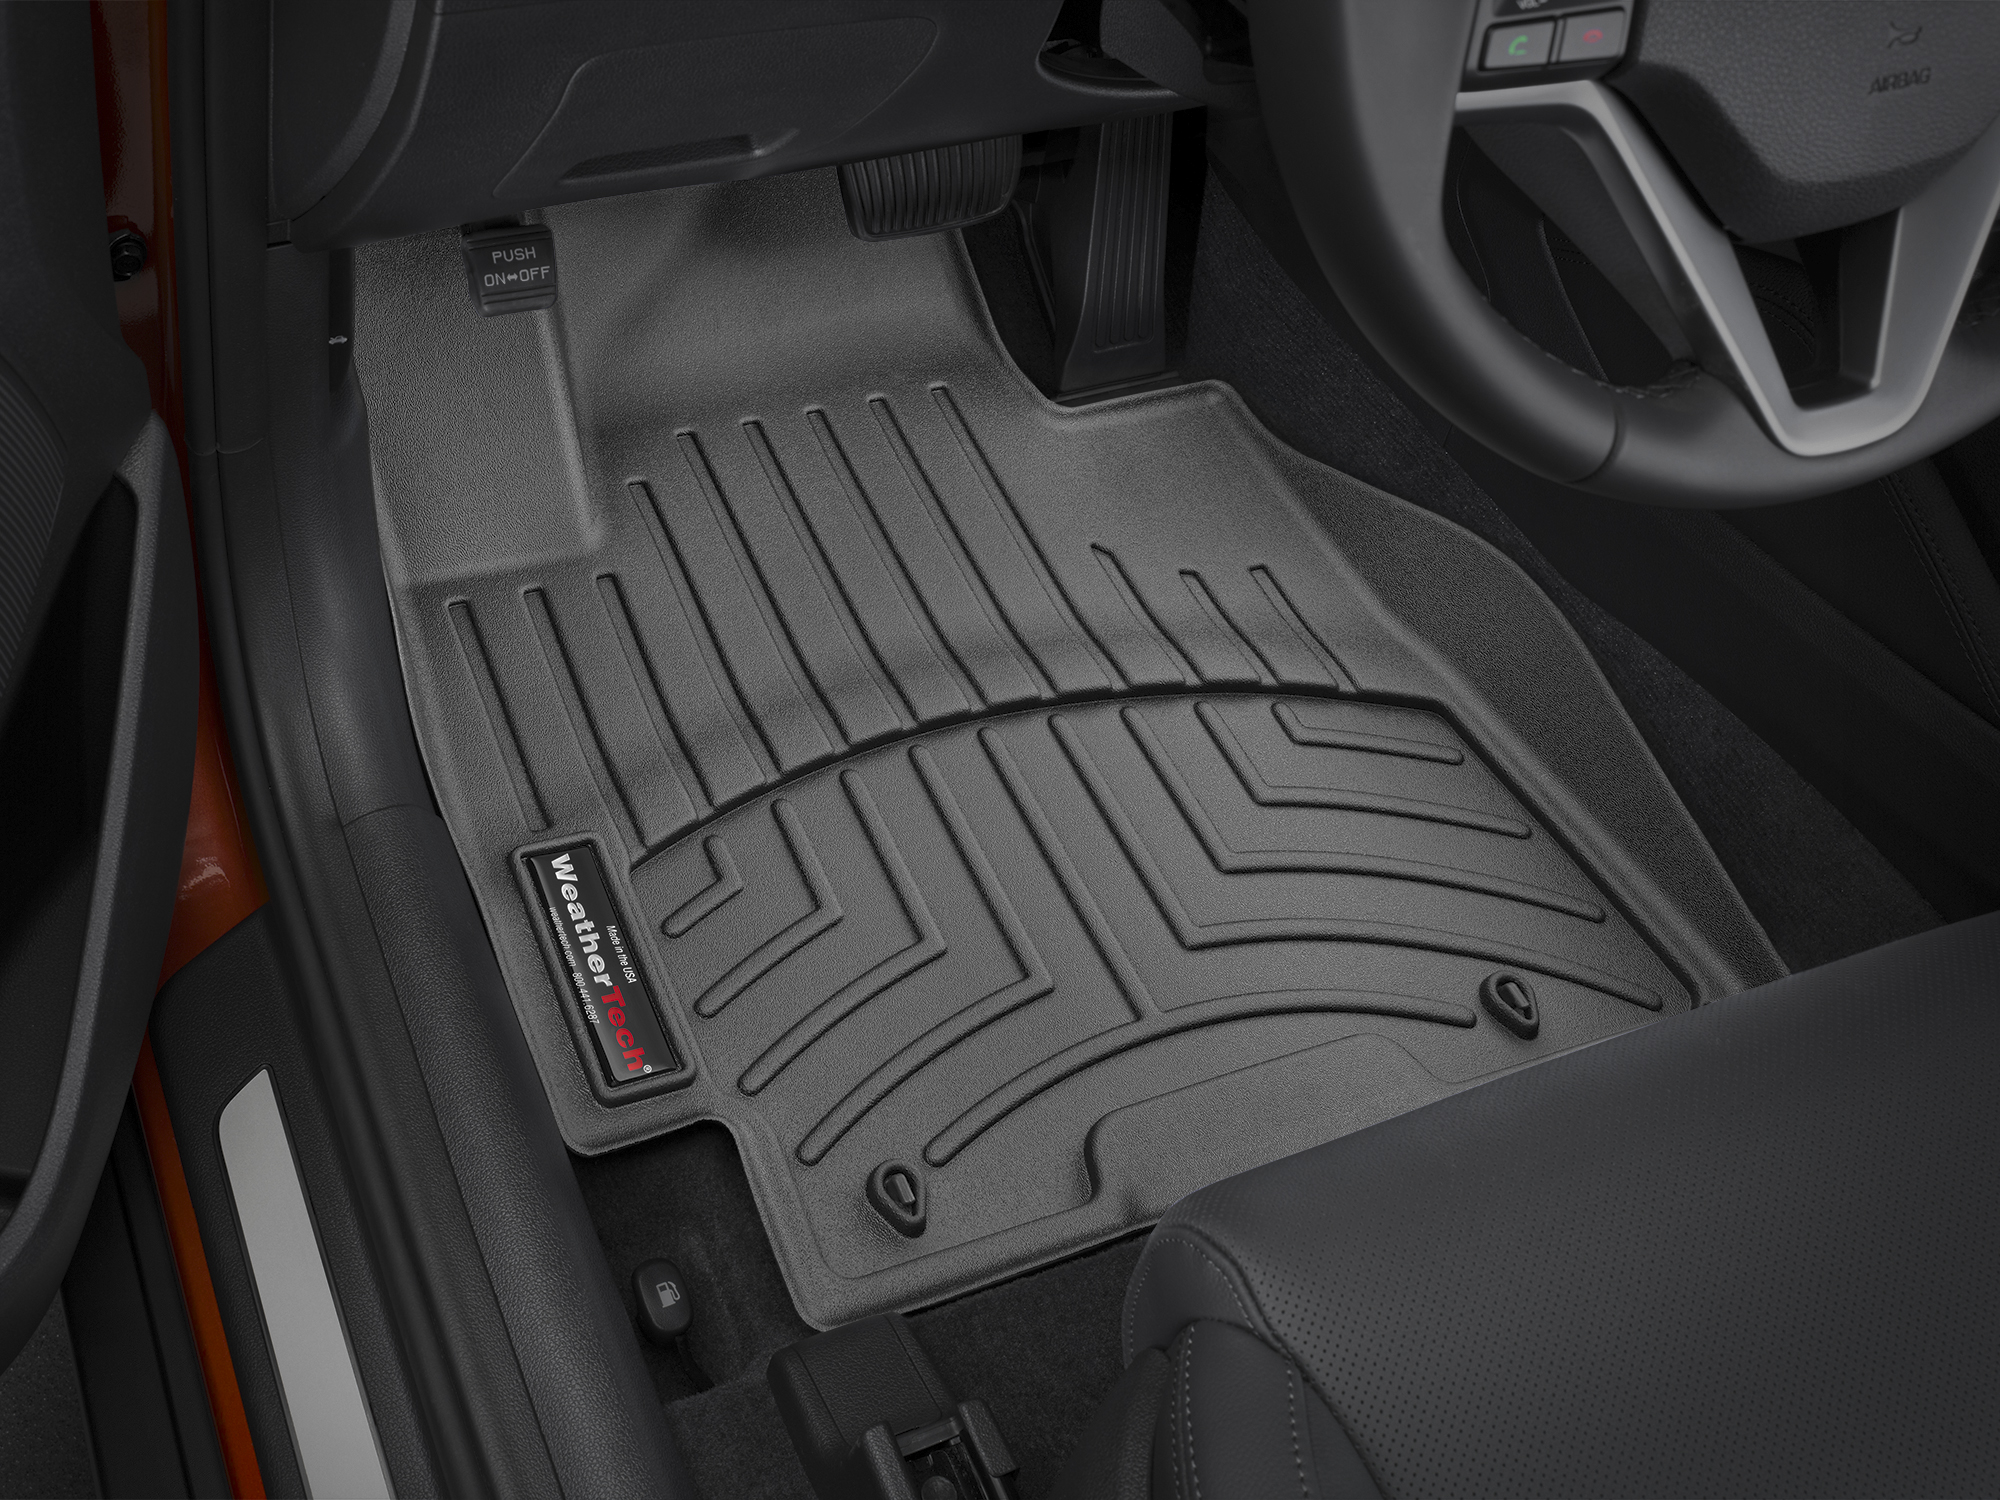 2017 Hyundai Tucson | AVM HD Floor Mats - Heavy Duty